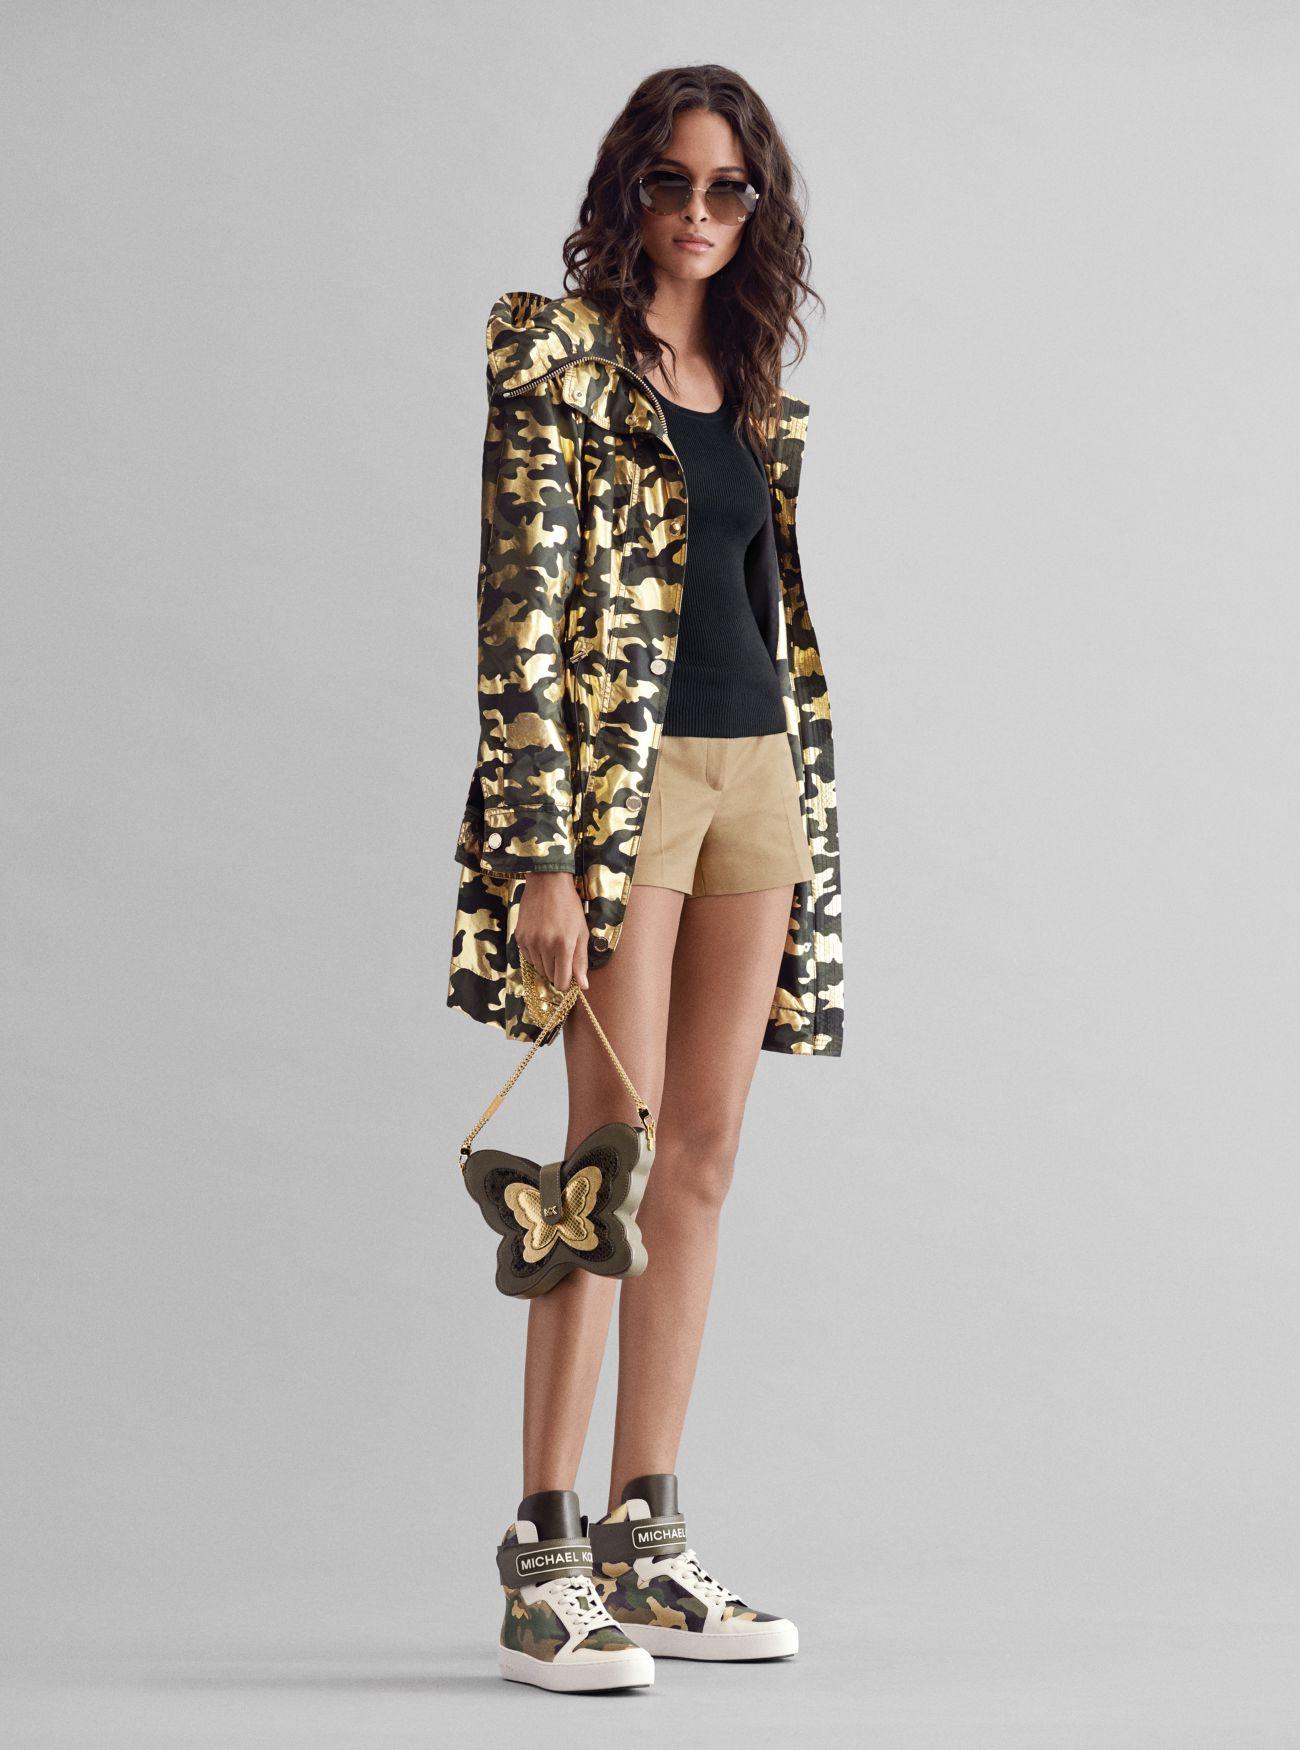 Anorak Mit Camouflagemuster, Tanktop, Shorts Aus Twill